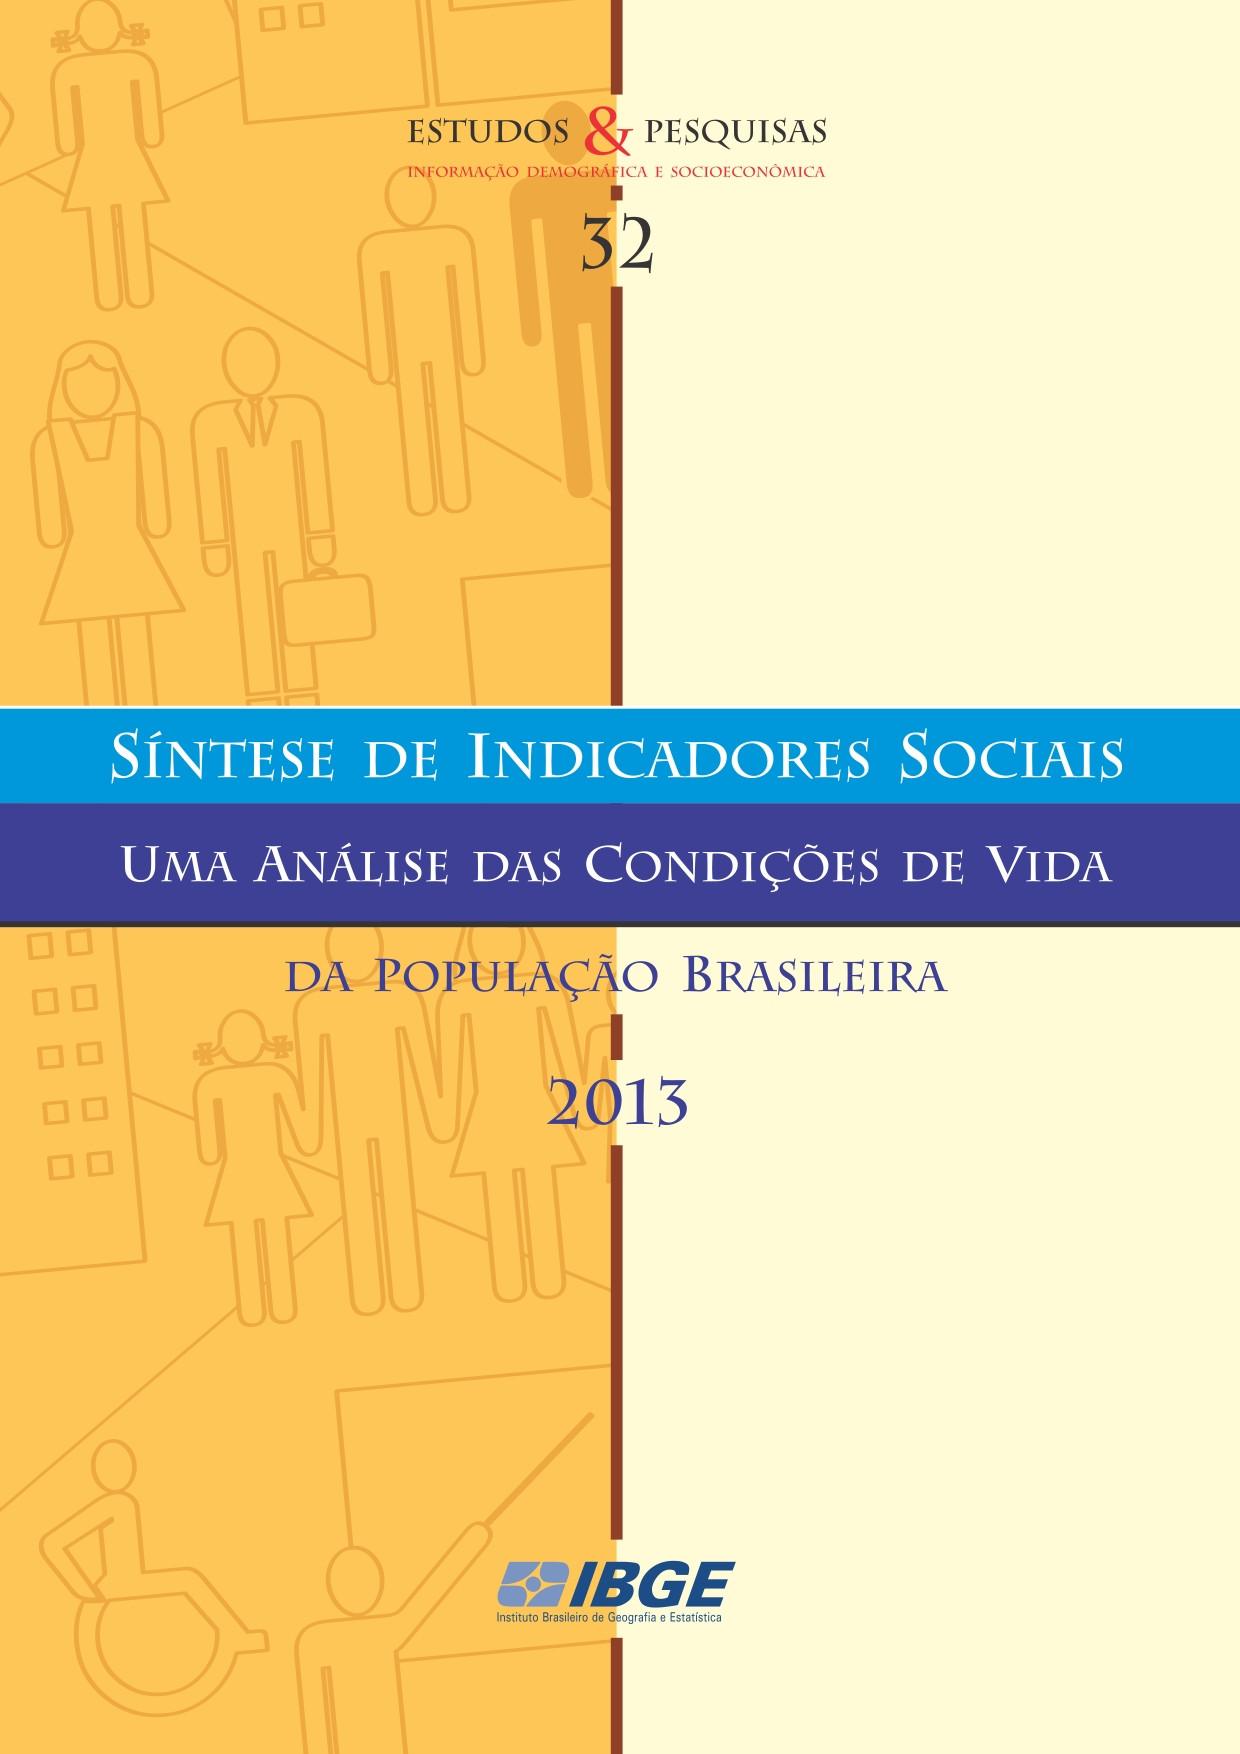 pdf comptia a certification comprehensive 2009 edition revised certblaster